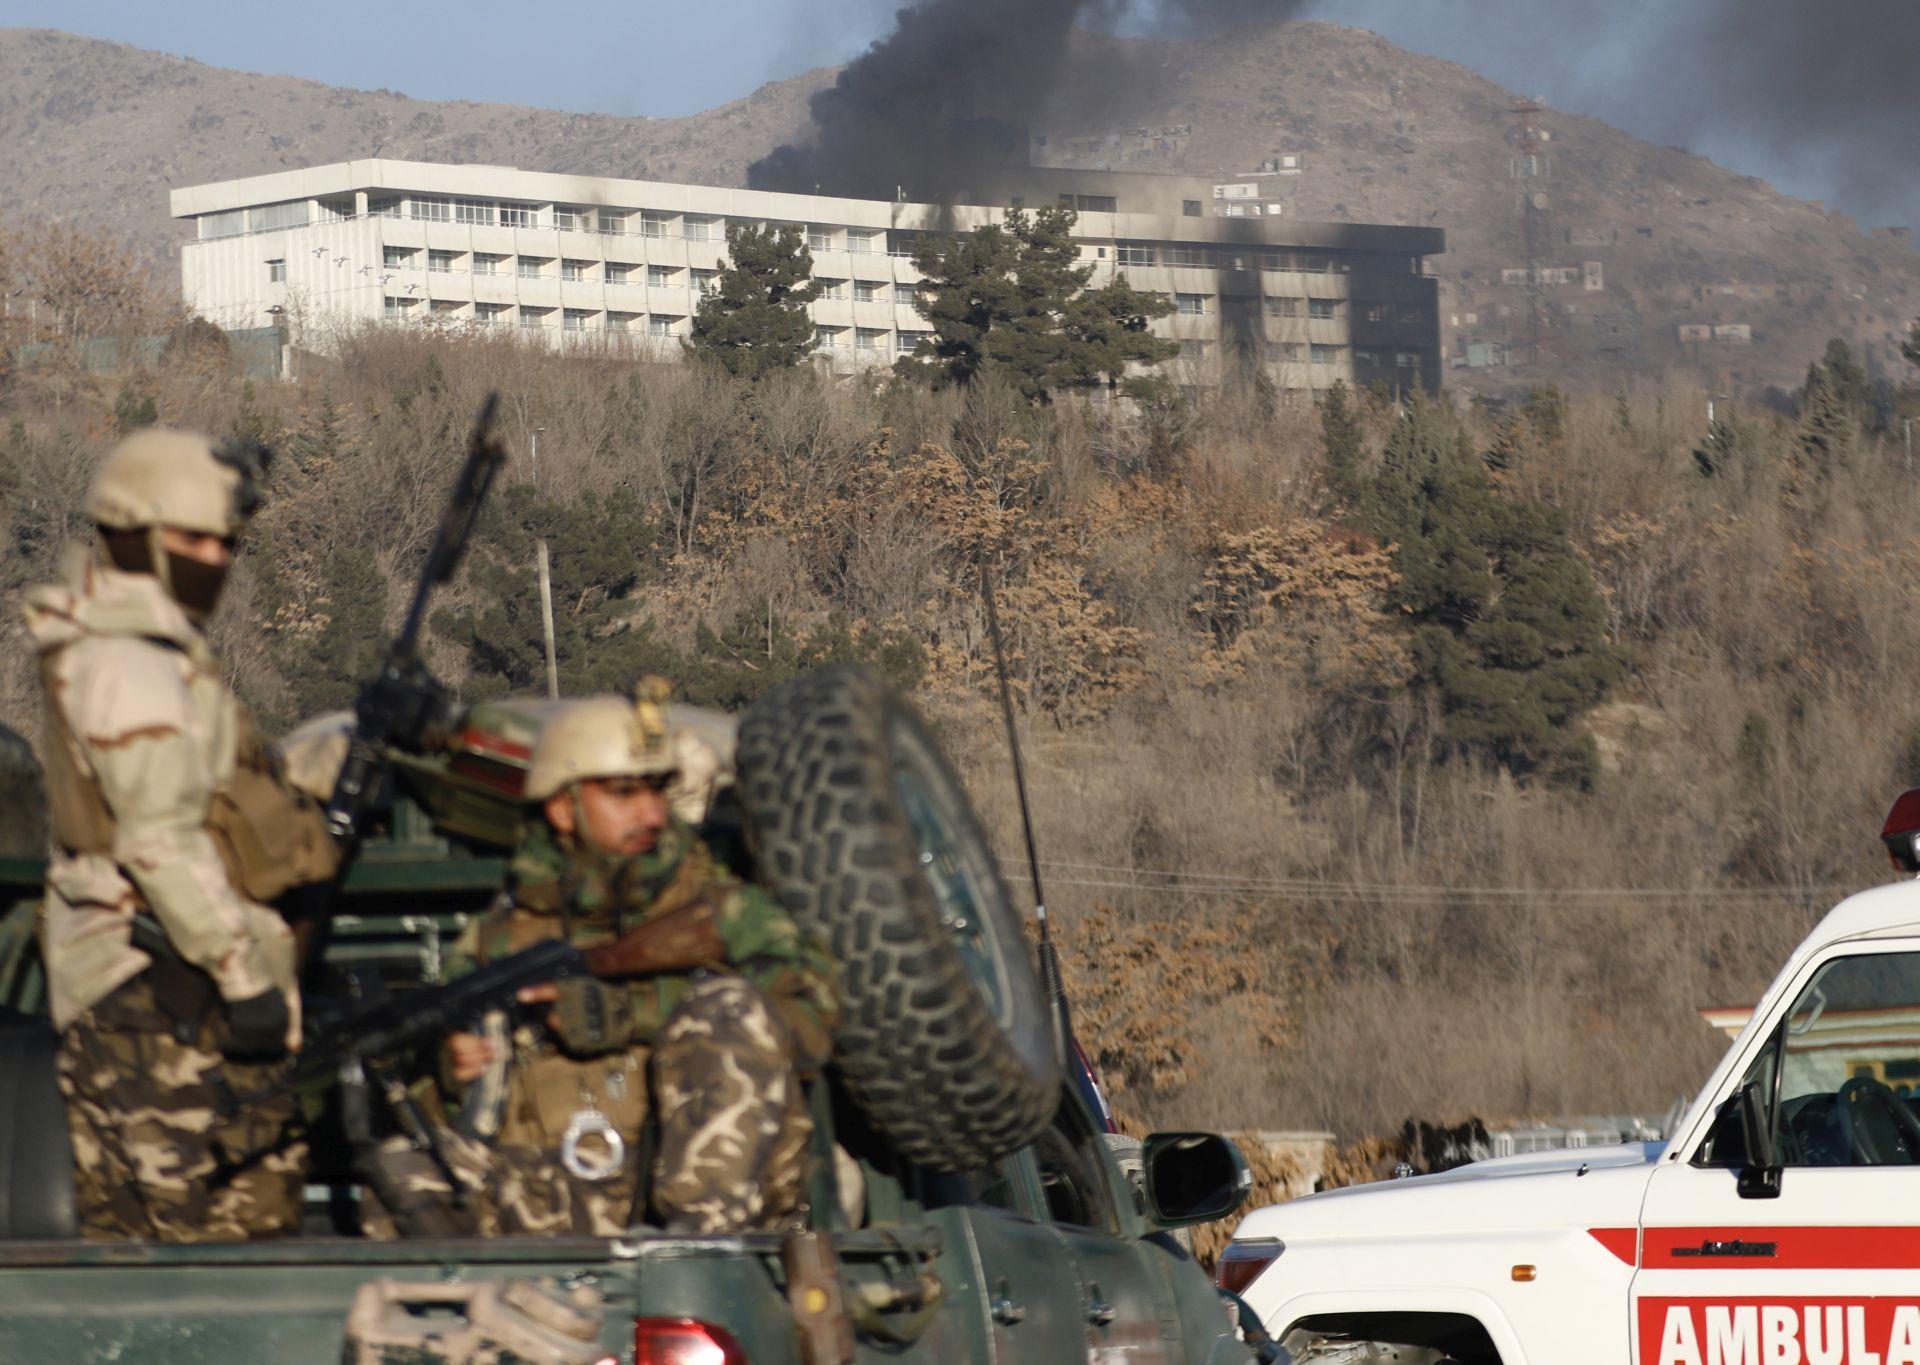 Talibani napali centar Kabula, skoro 100 poginulih